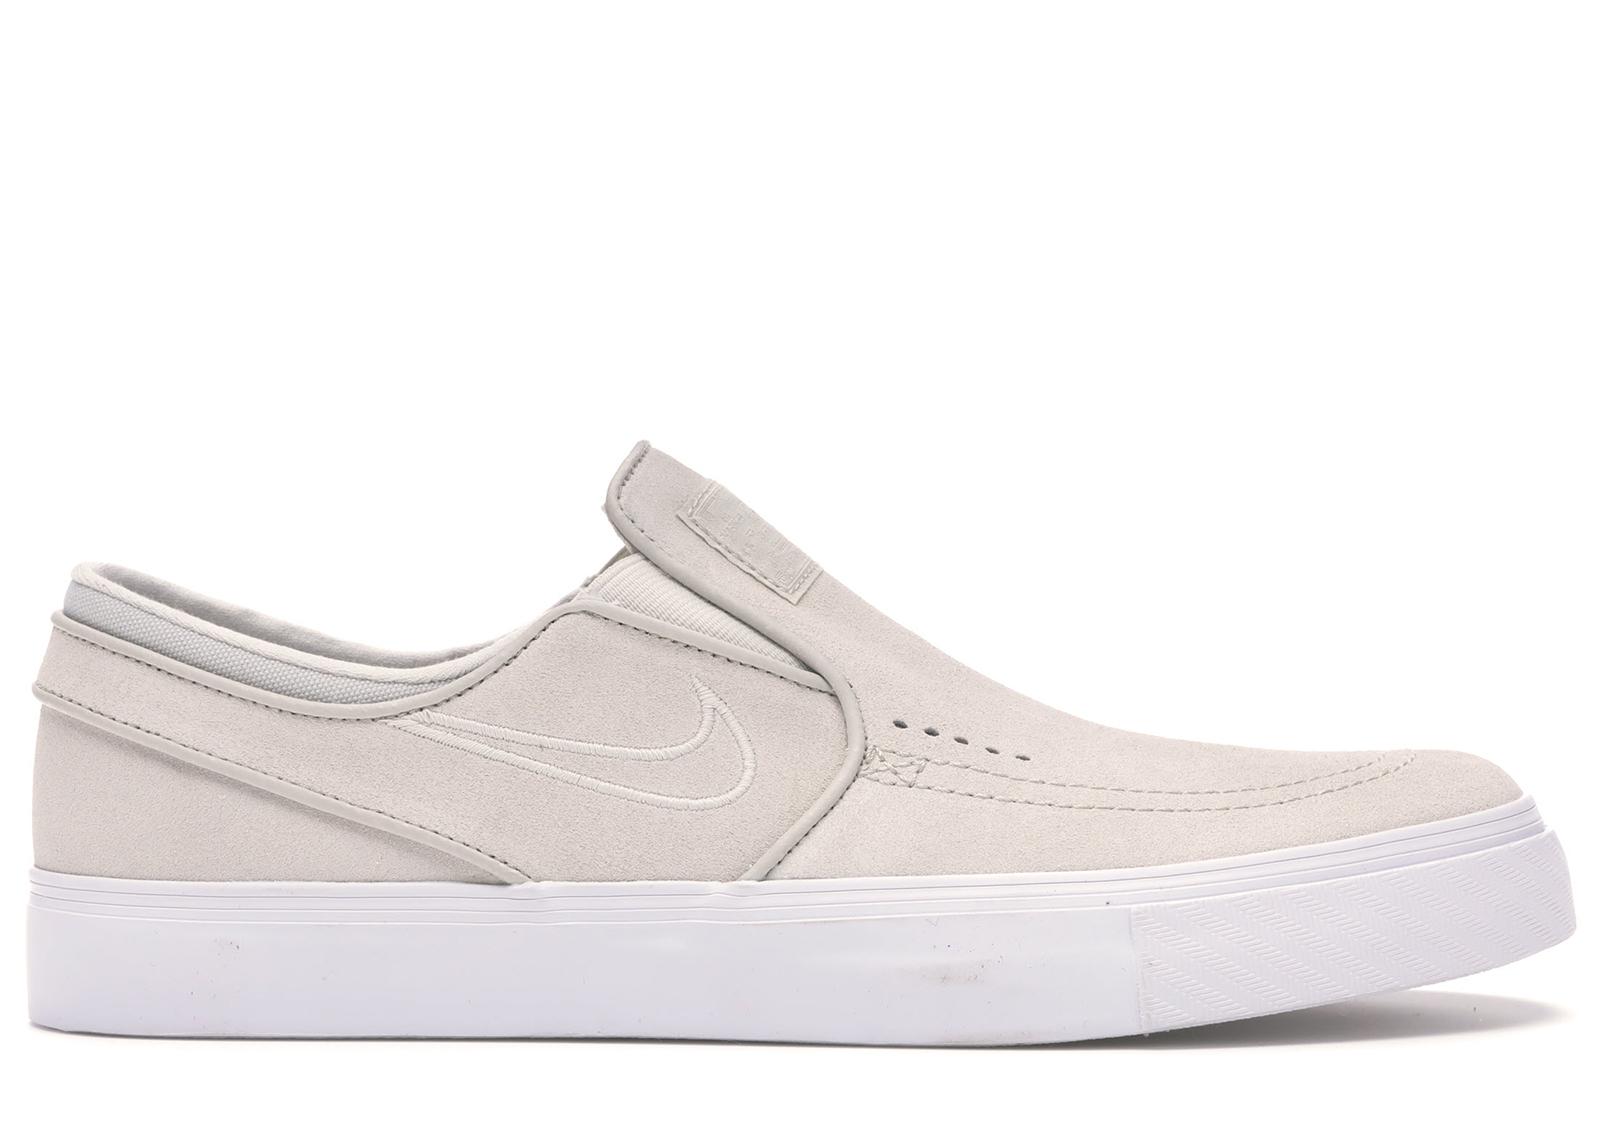 Nike SB Zoom Stefan Janoski Slip-On Light Bone - 833564-100